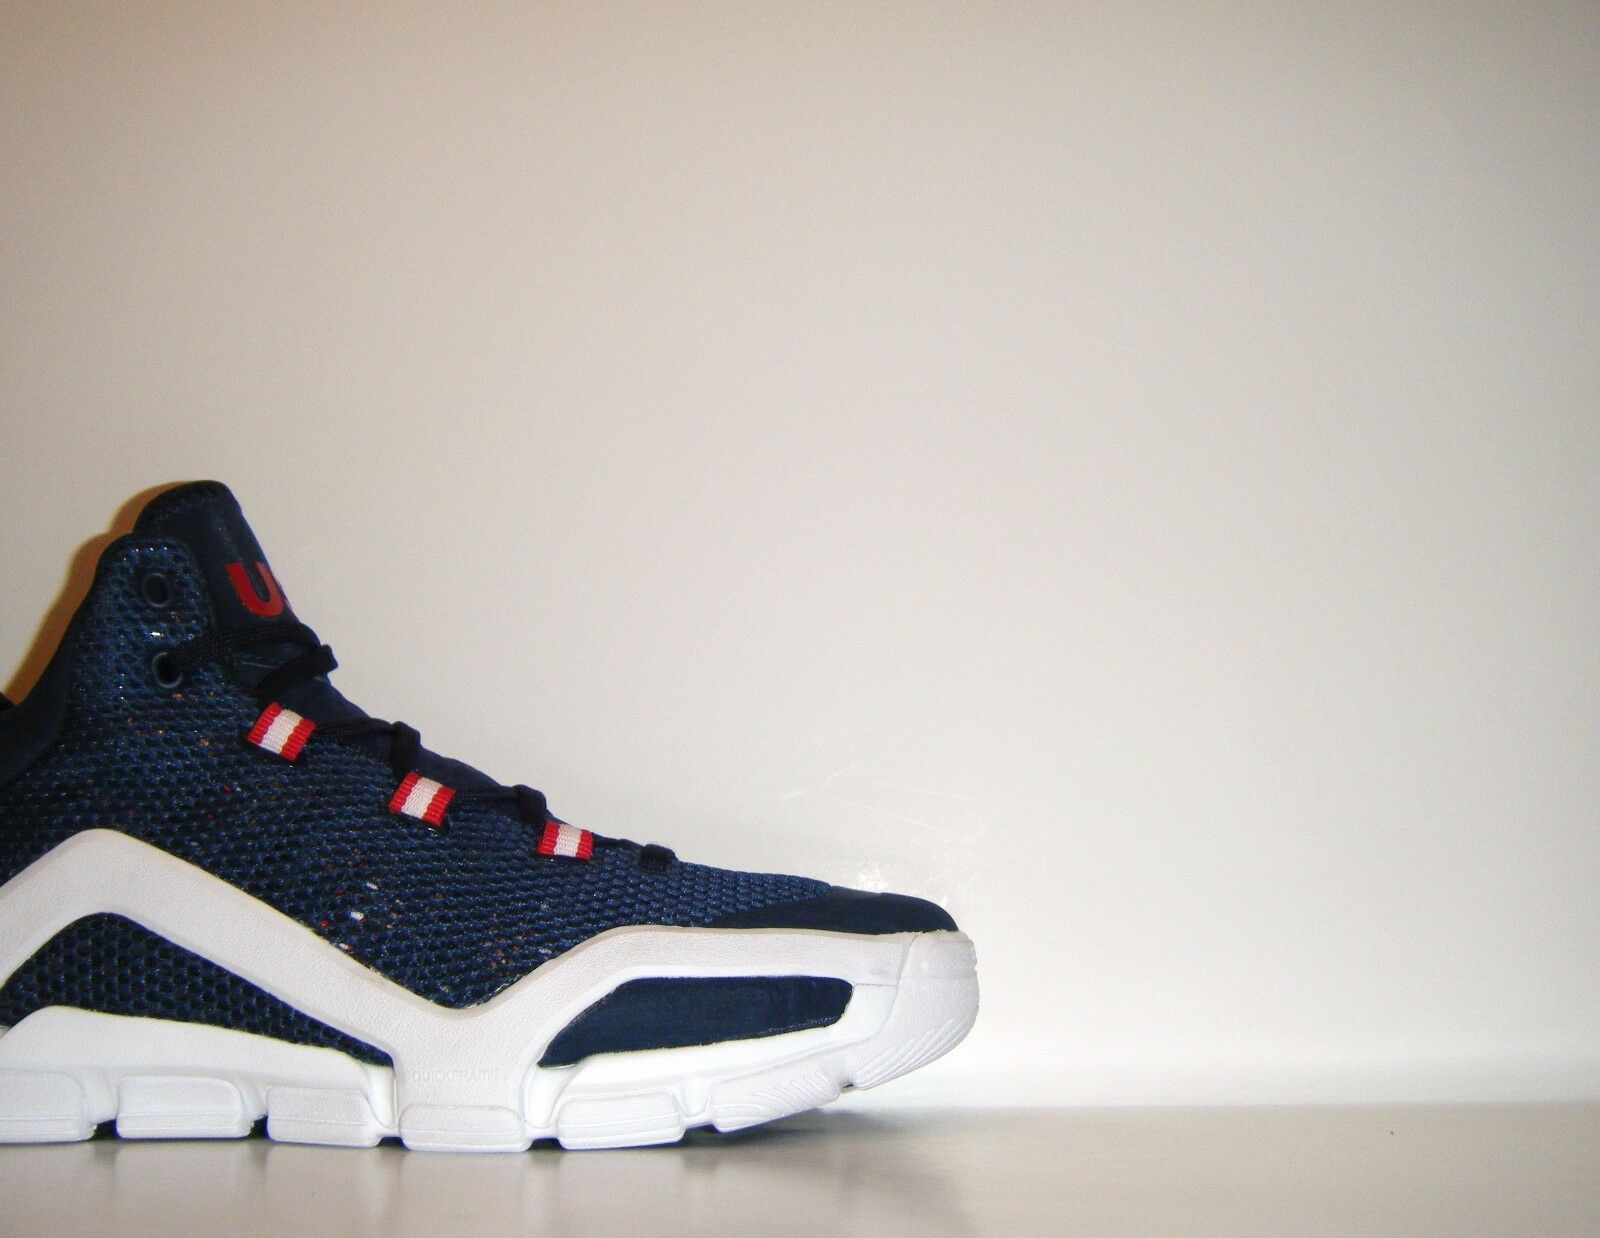 Adidas CrazyQuick 3 USA Olympic Promo PE Sample 9 John Wall Boost Harden Lillard